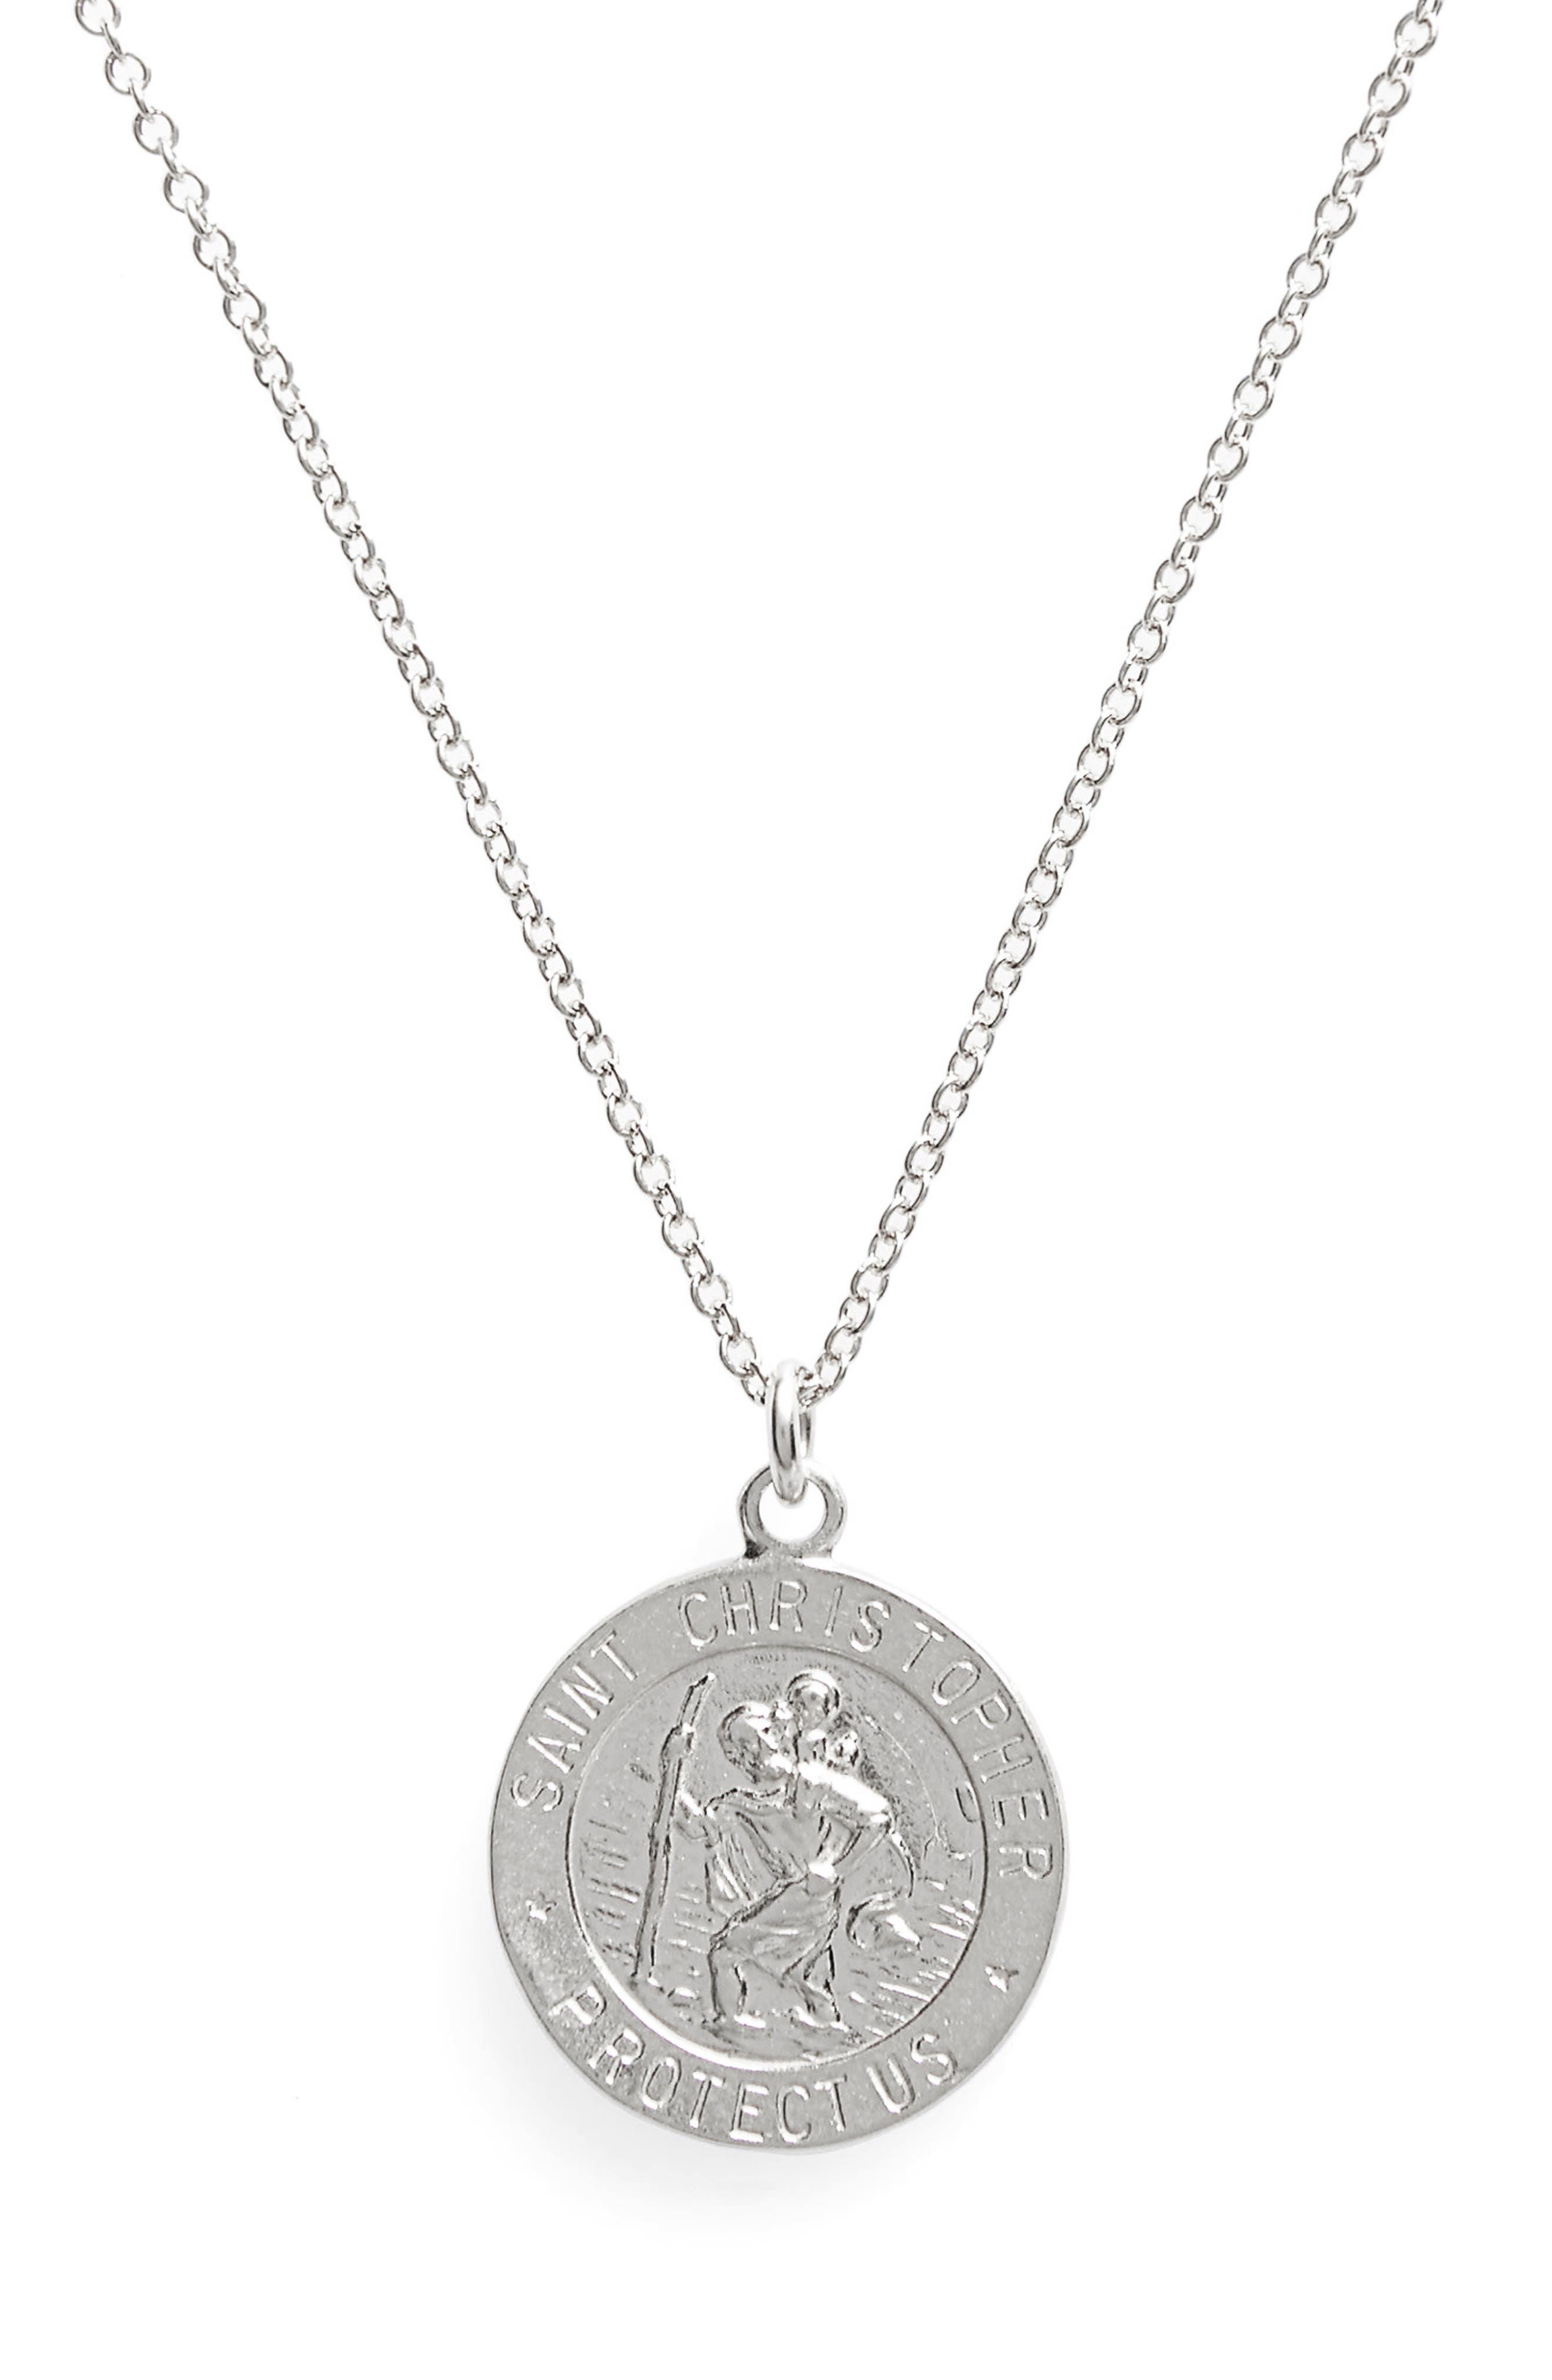 St. Christopher Pendant Necklace,                             Alternate thumbnail 2, color,                             Silver